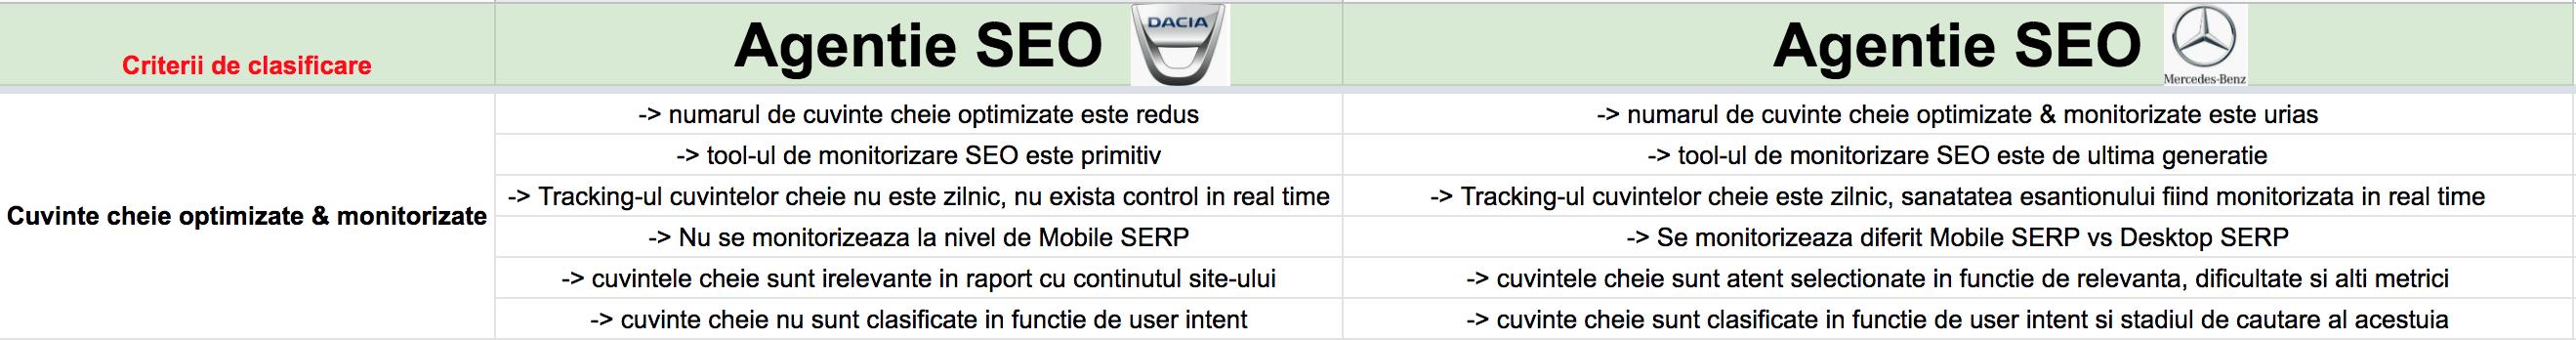 agentie seo - clasificare dupa cuvinte cheie